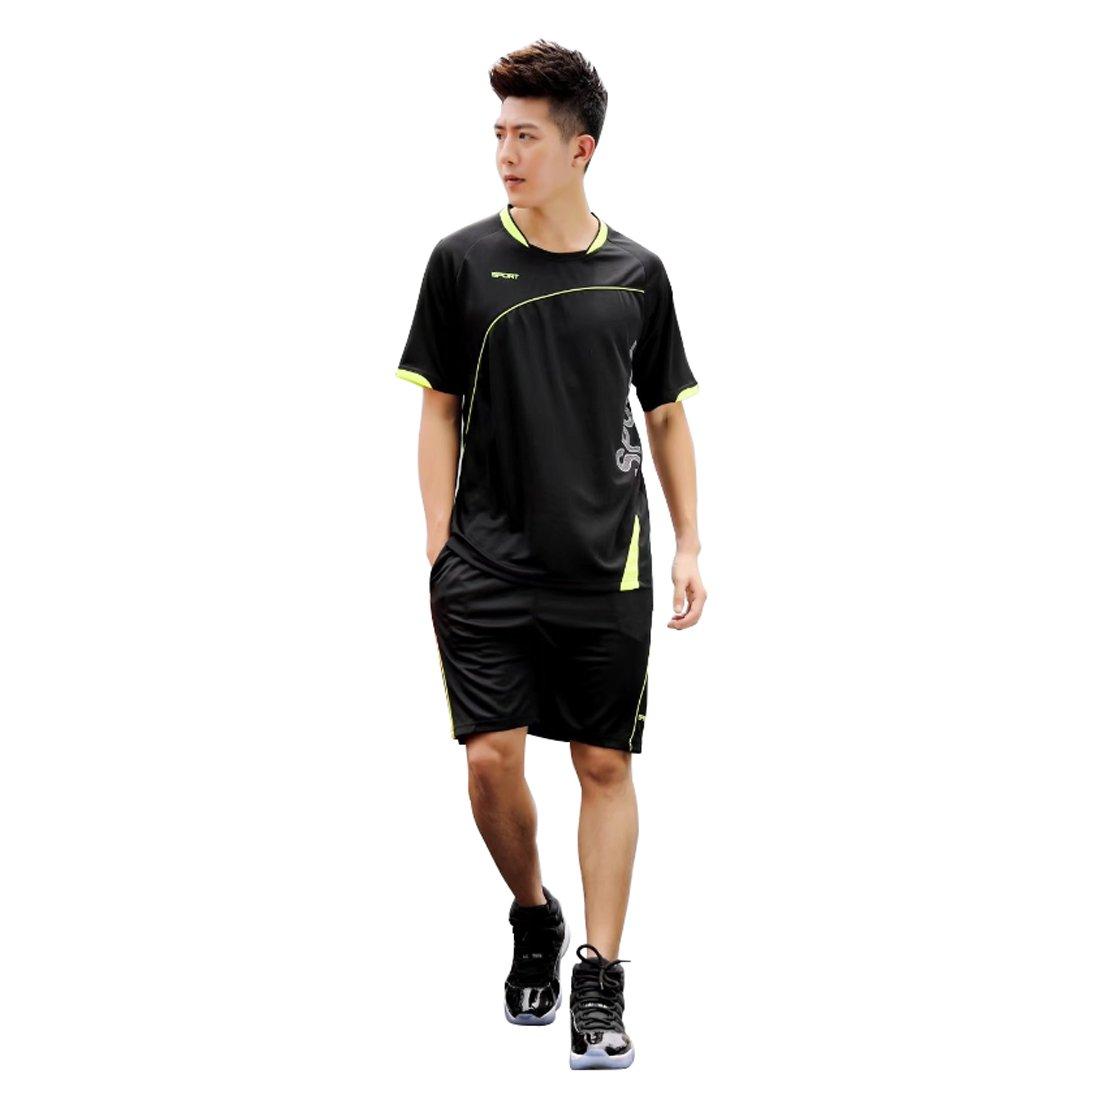 Inlefen Men Kids Sportswear Short Sleeve Clothes Fitness Basketball